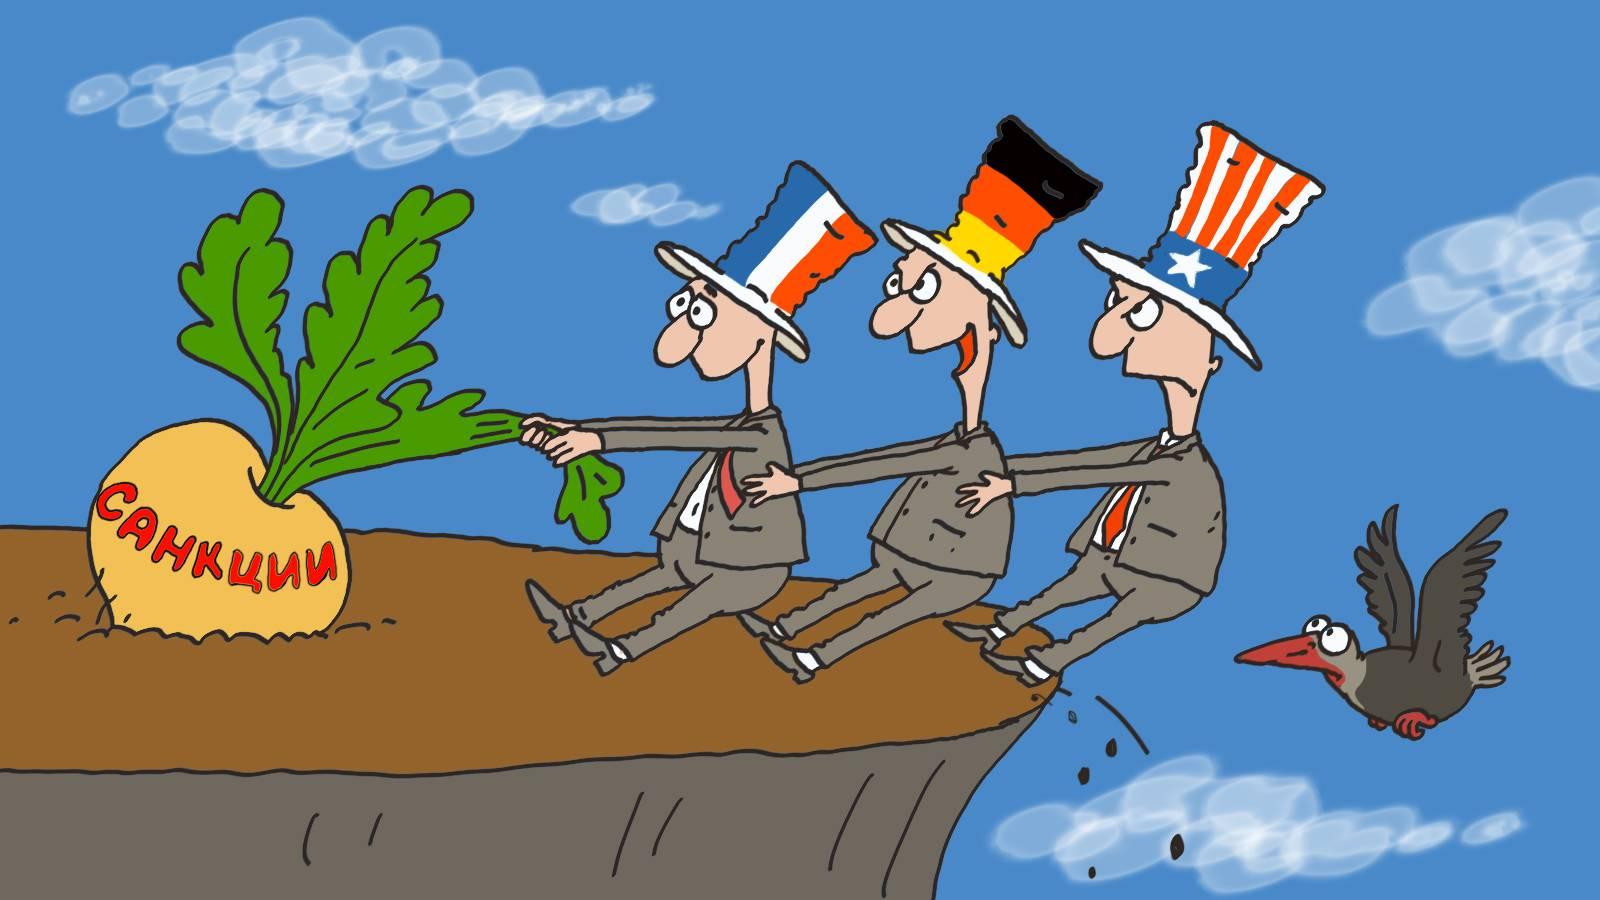 санкции карикатура